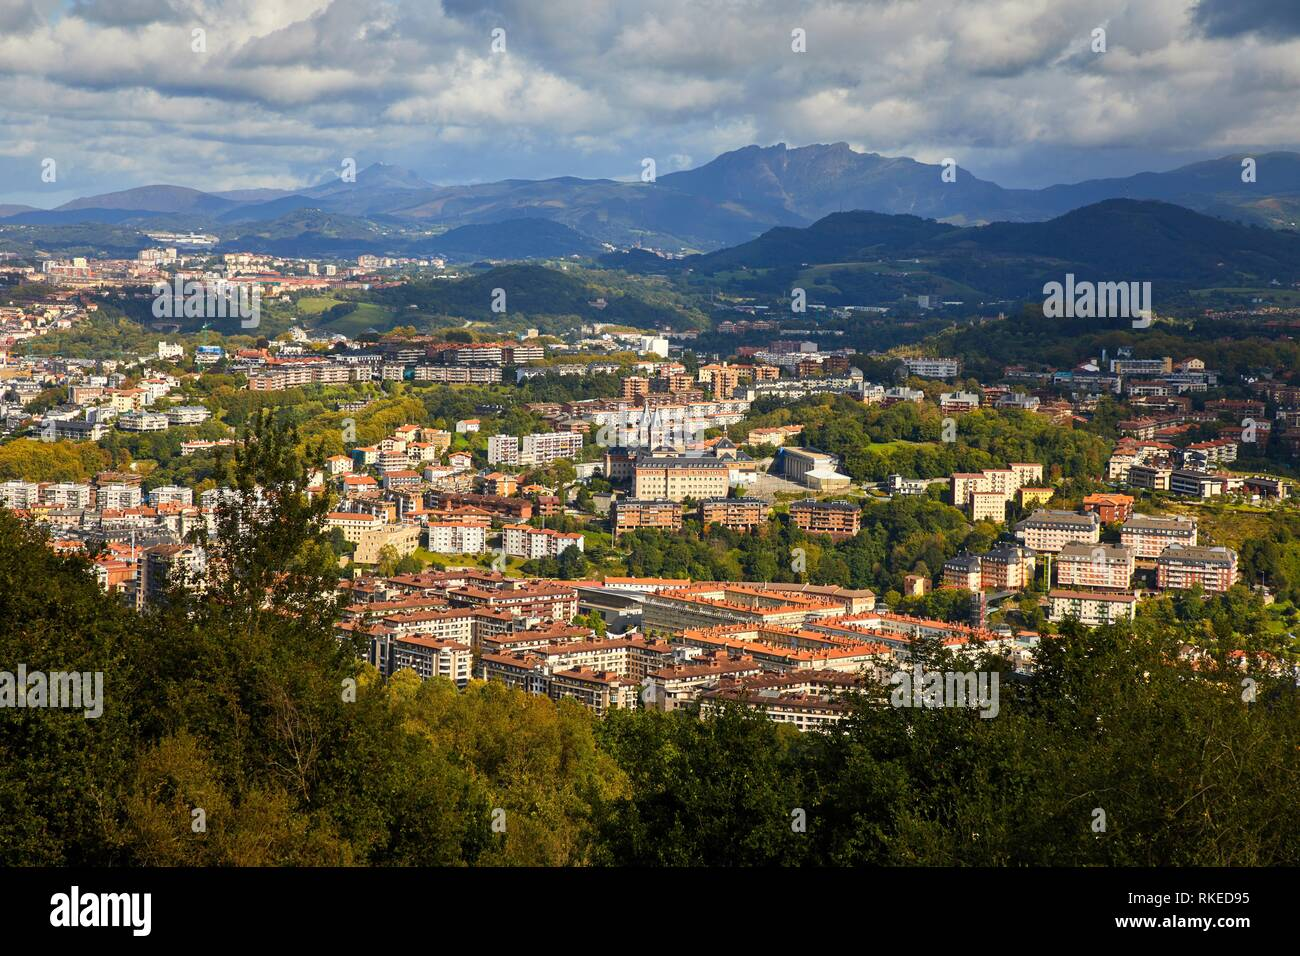 Antiguo quarter, Donostia, San Sebastian, Gipuzkoa, Basque Country, Spain, Europe - Stock Image